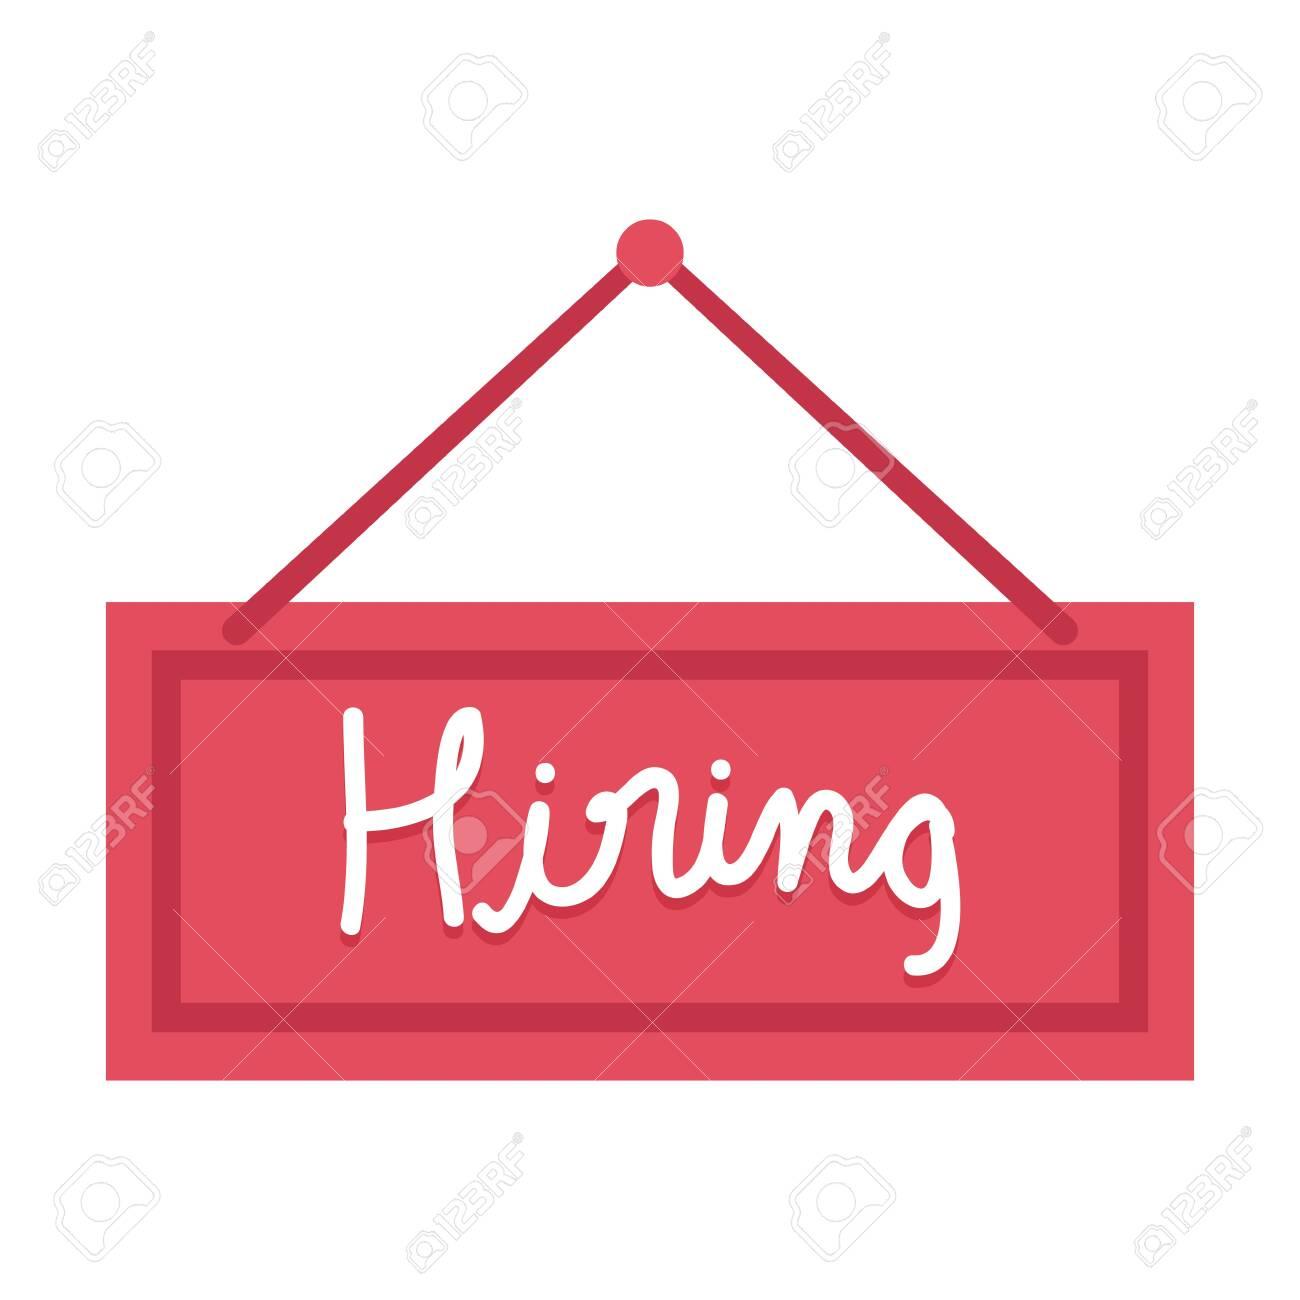 hiring label hanging icon vector illustration design - 124699369